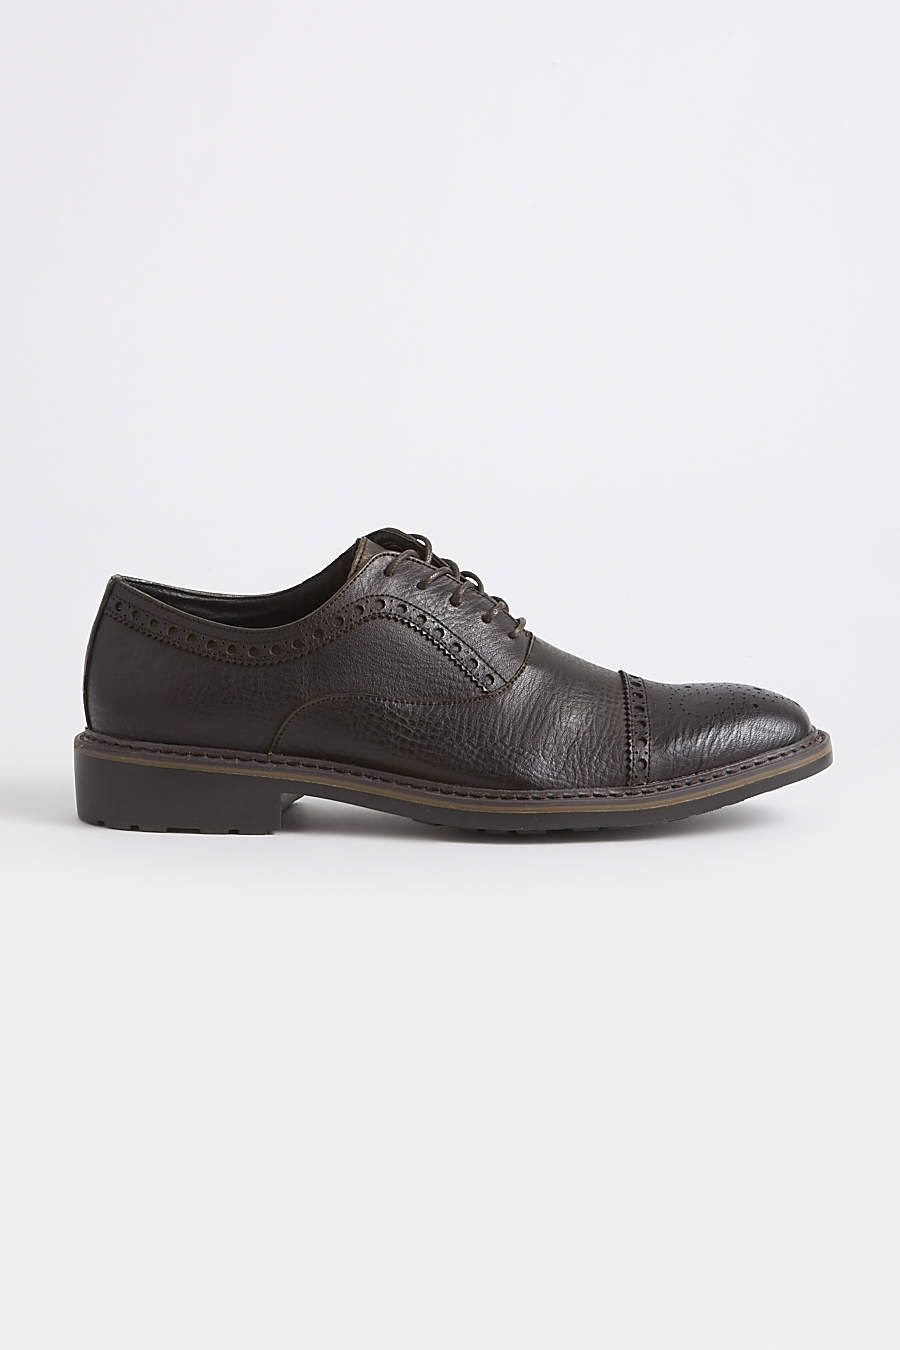 Robert Wayne Alton Shoe